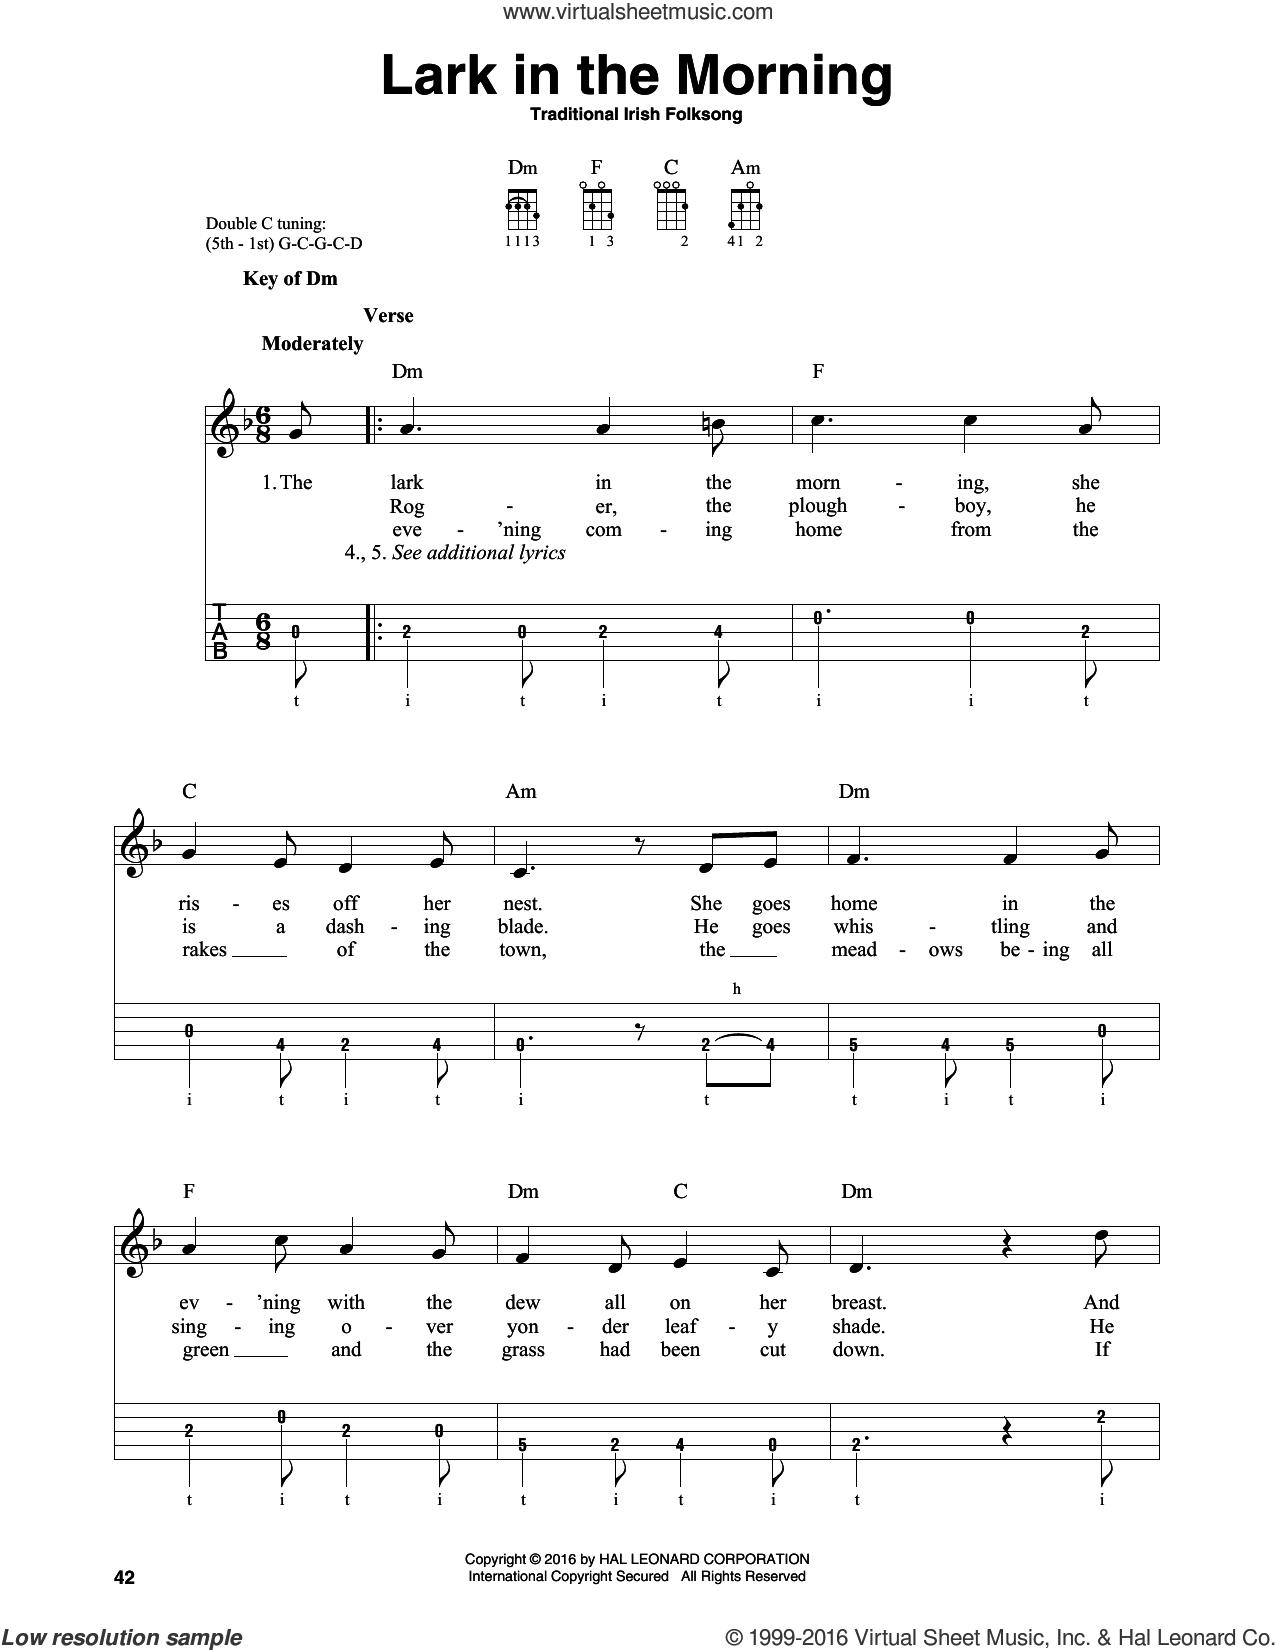 Lark In The Morning sheet music for banjo solo, intermediate skill level